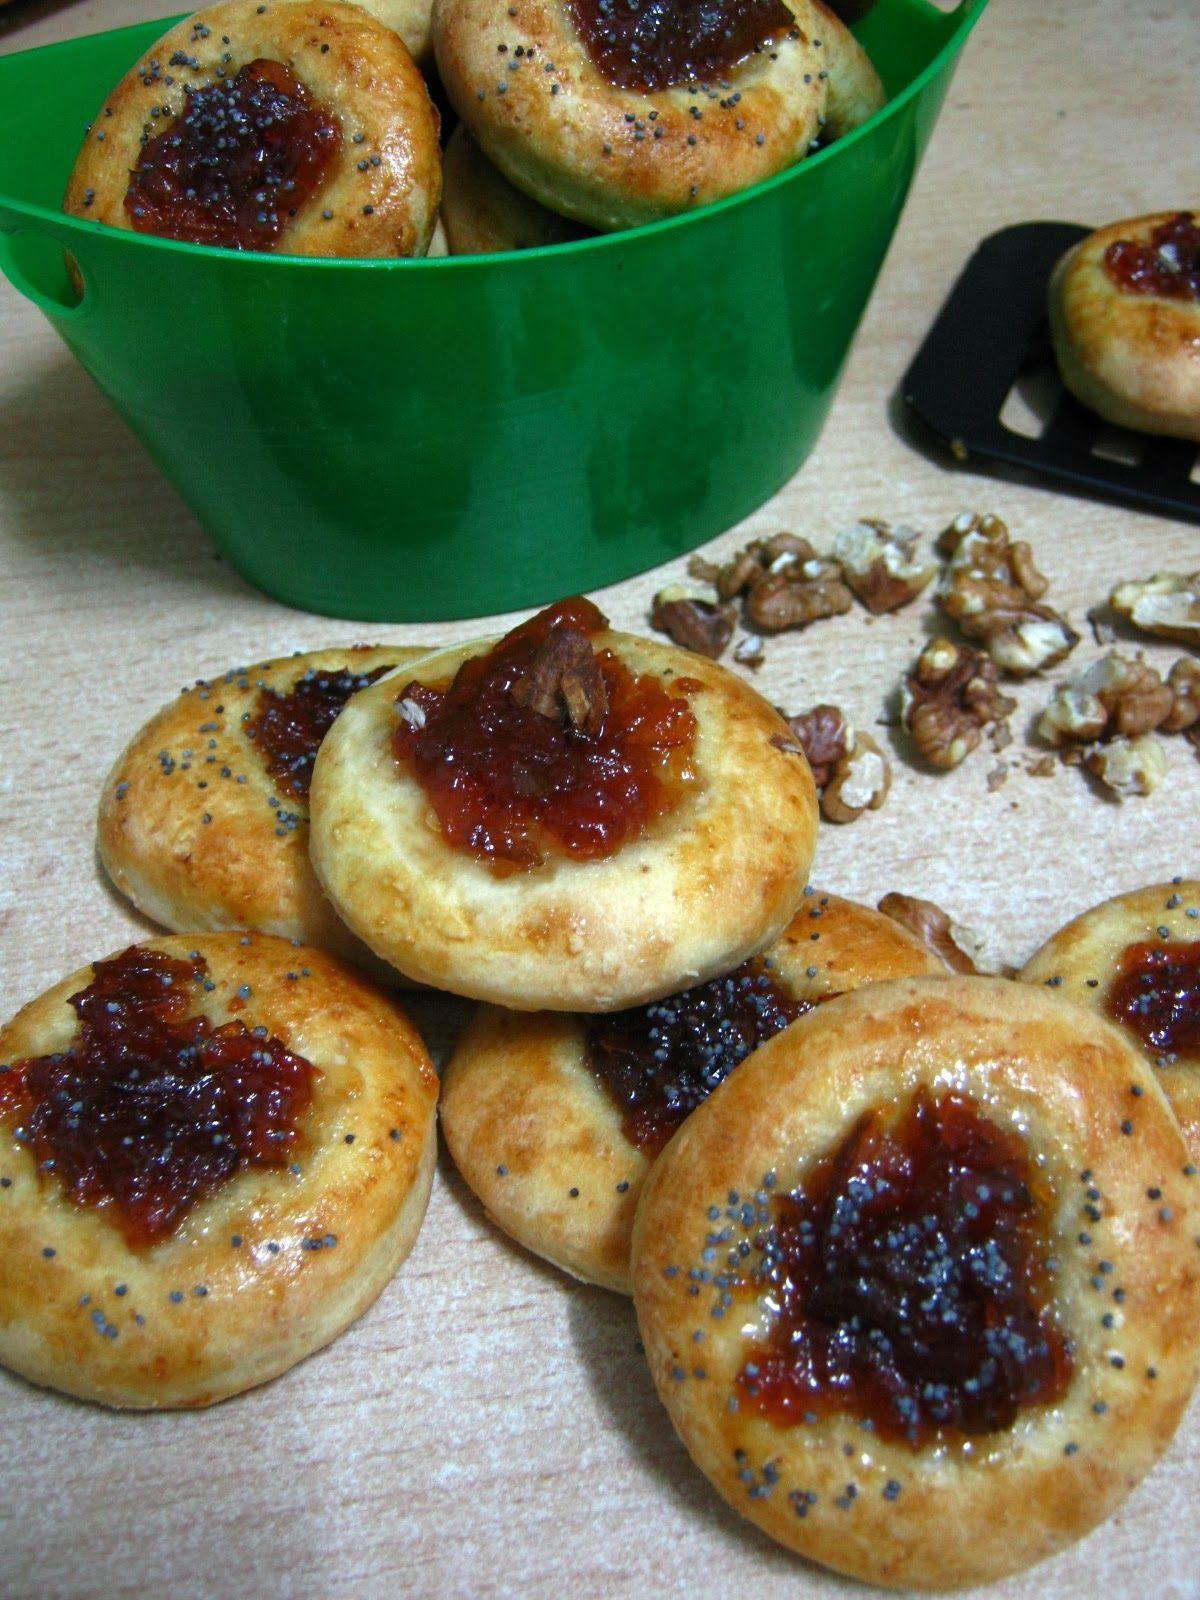 Droopi's everything (but the kitchen sink): Banuti cu gem